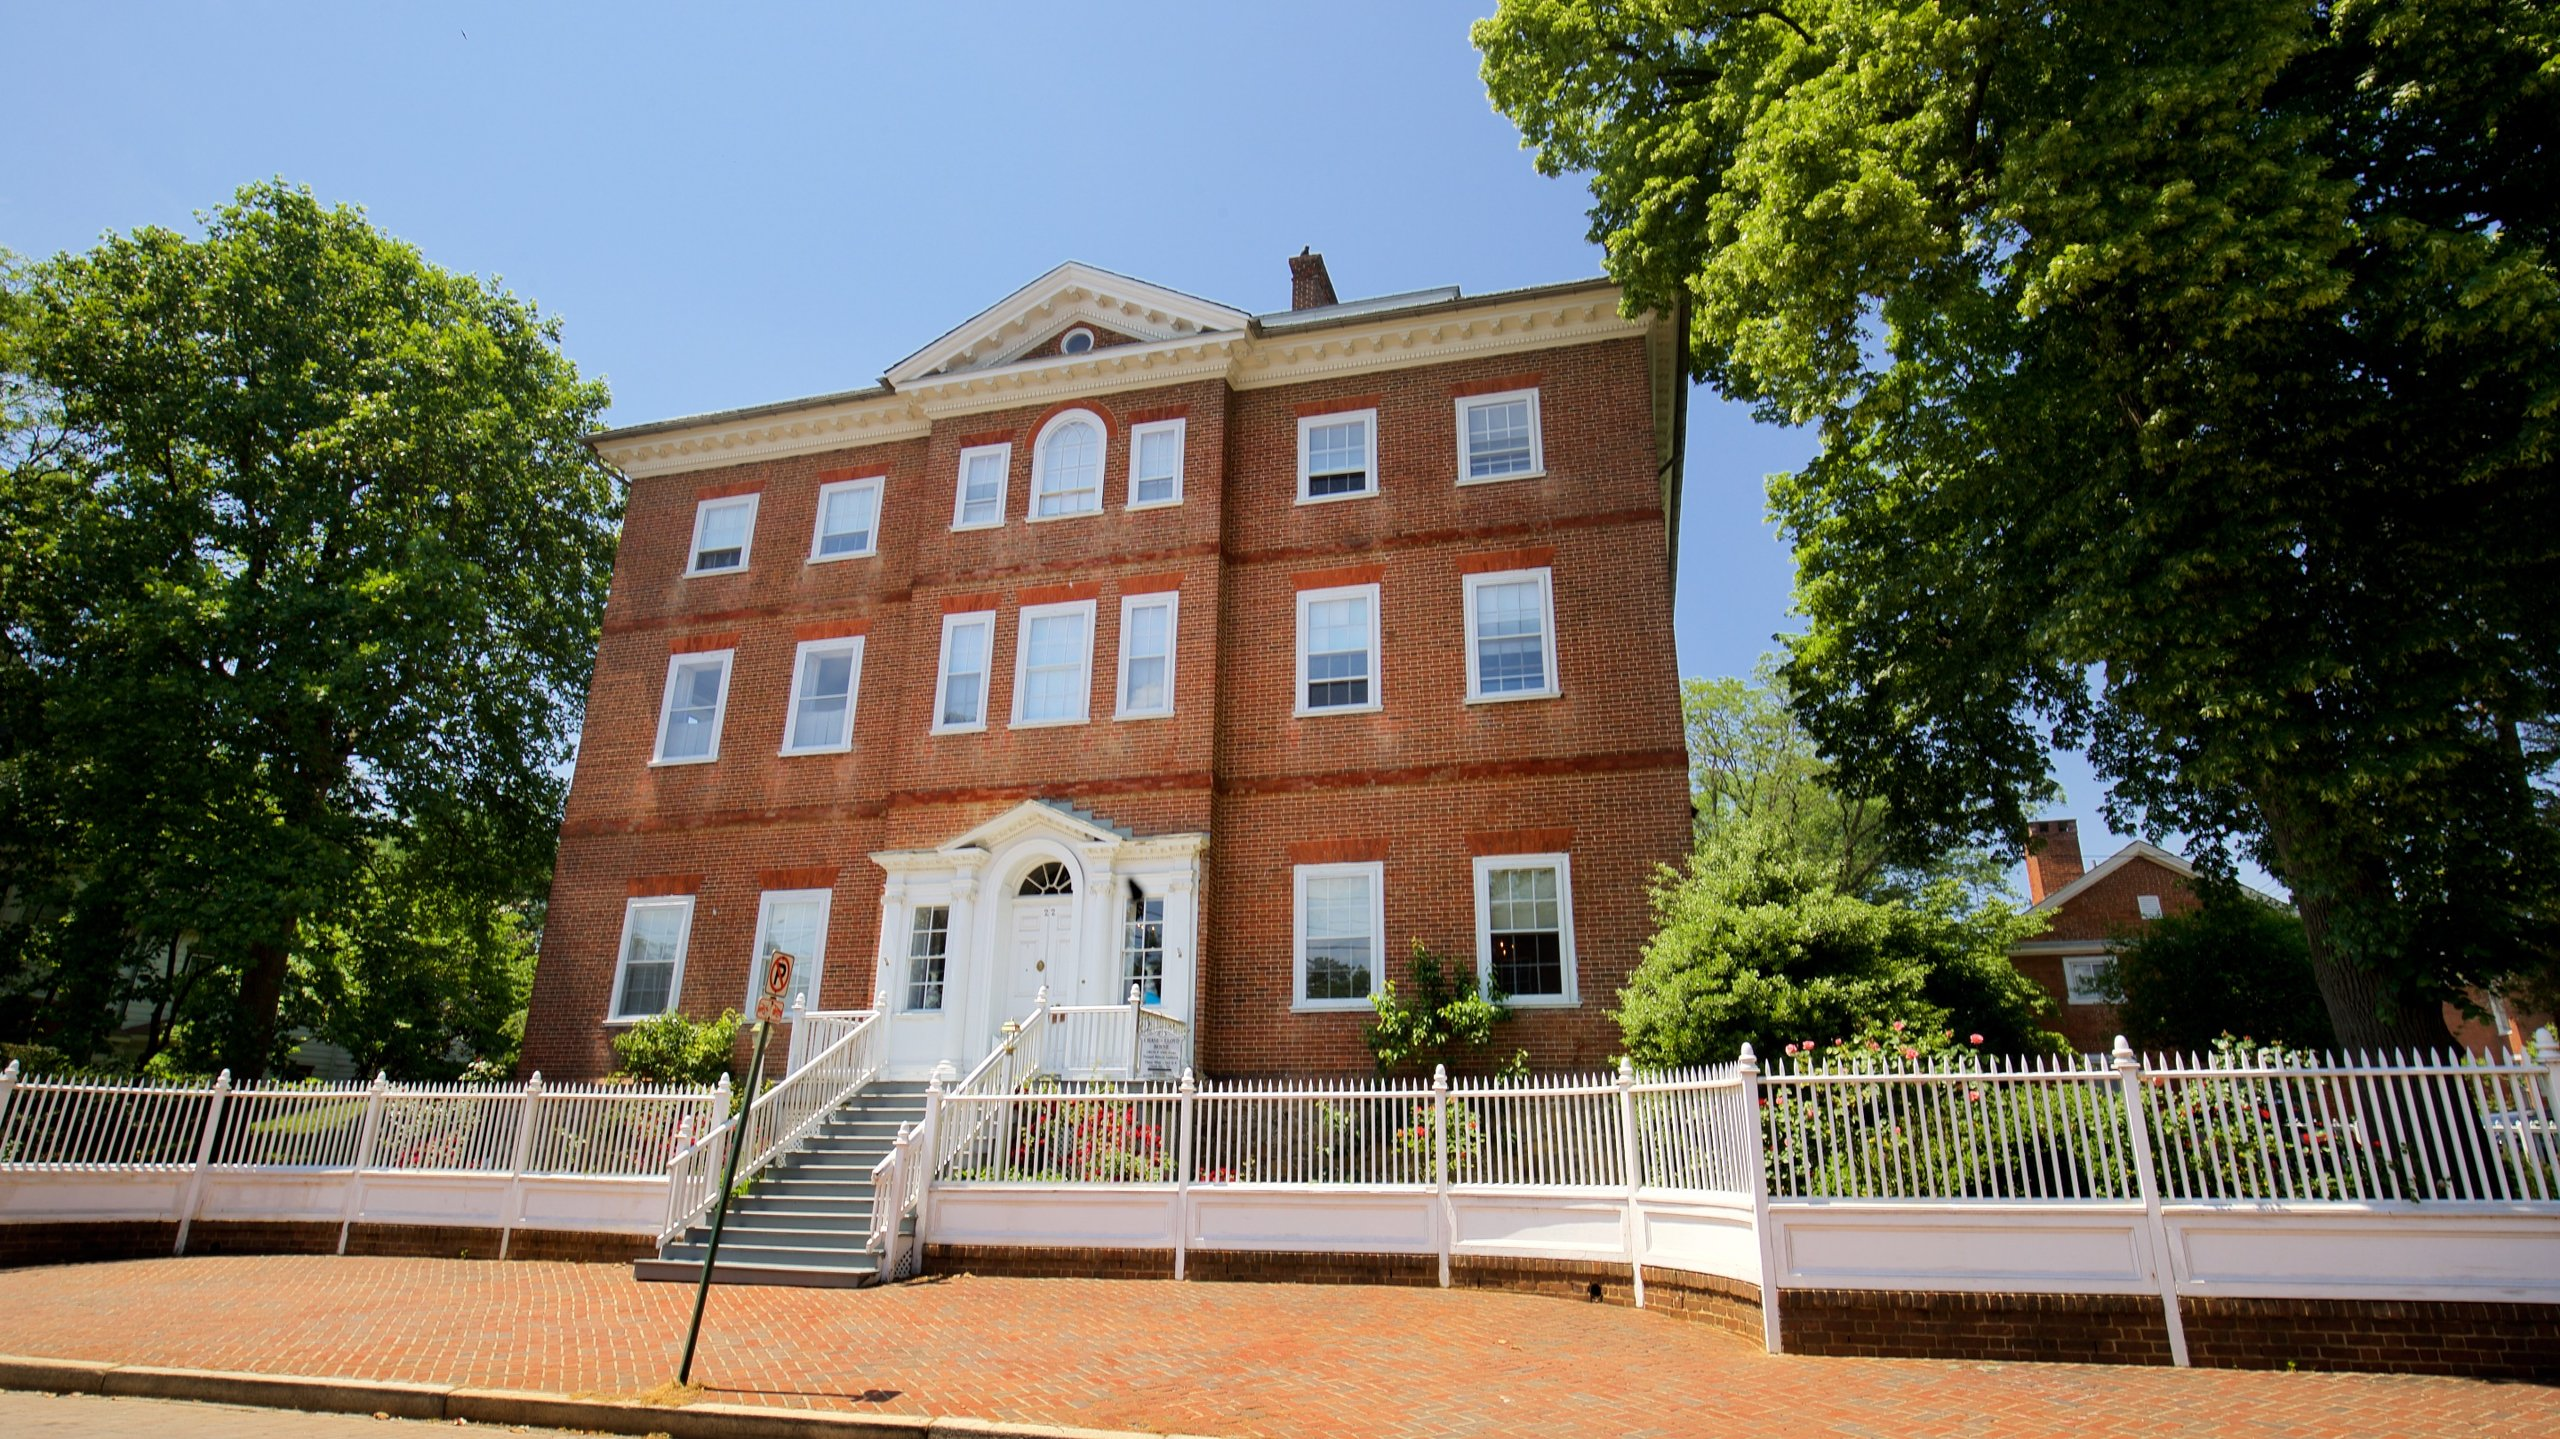 Chase Lloyd House, Annapolis, Maryland, United States of America